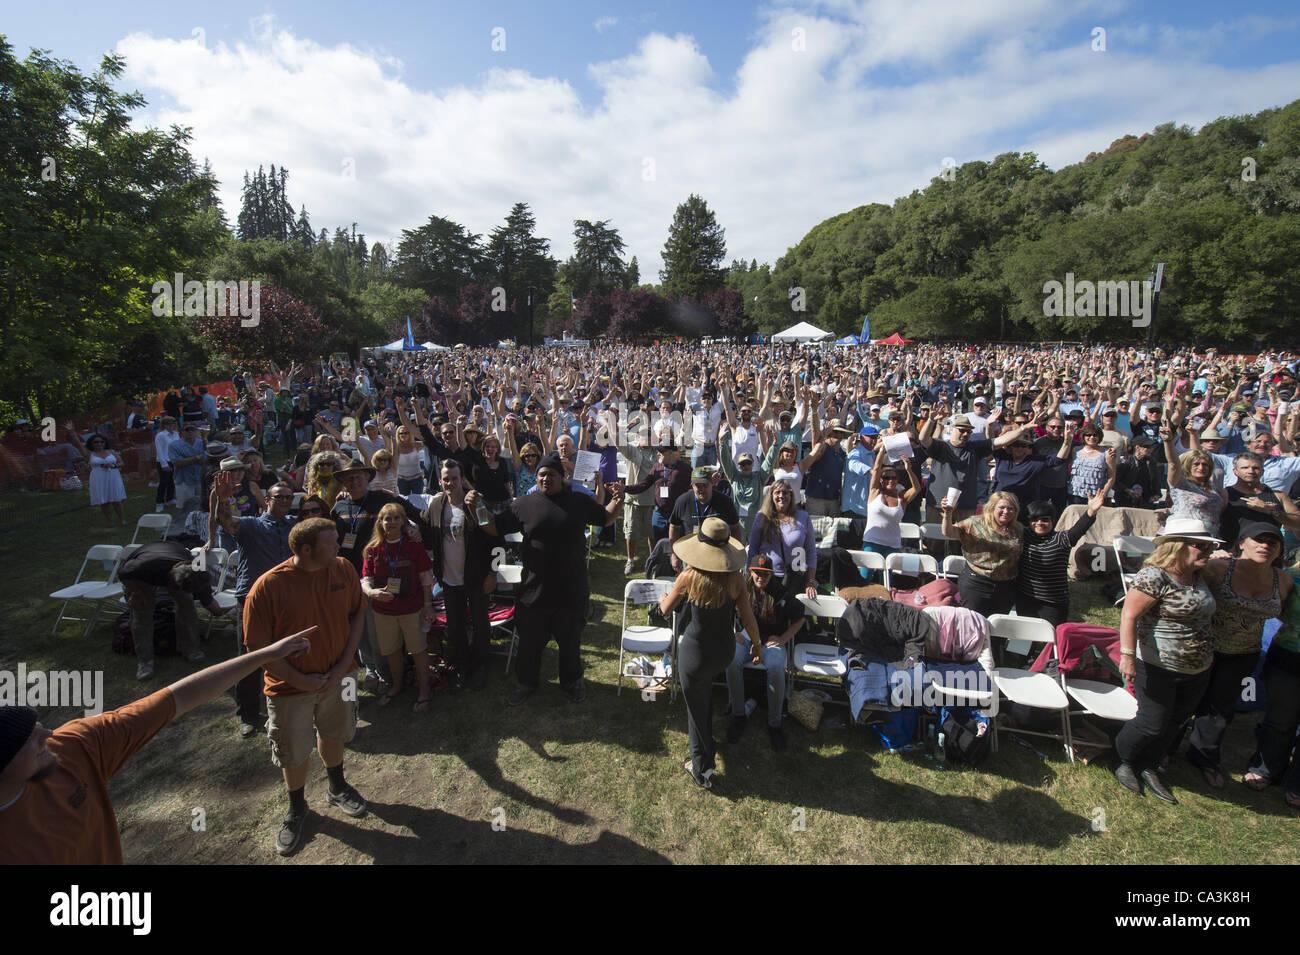 May 26, 2012 - Aptos, CA, USA - Crowd at the 20th annual Santa Cruz Blues Festival. (Credit Image: © Jerome - Stock Image